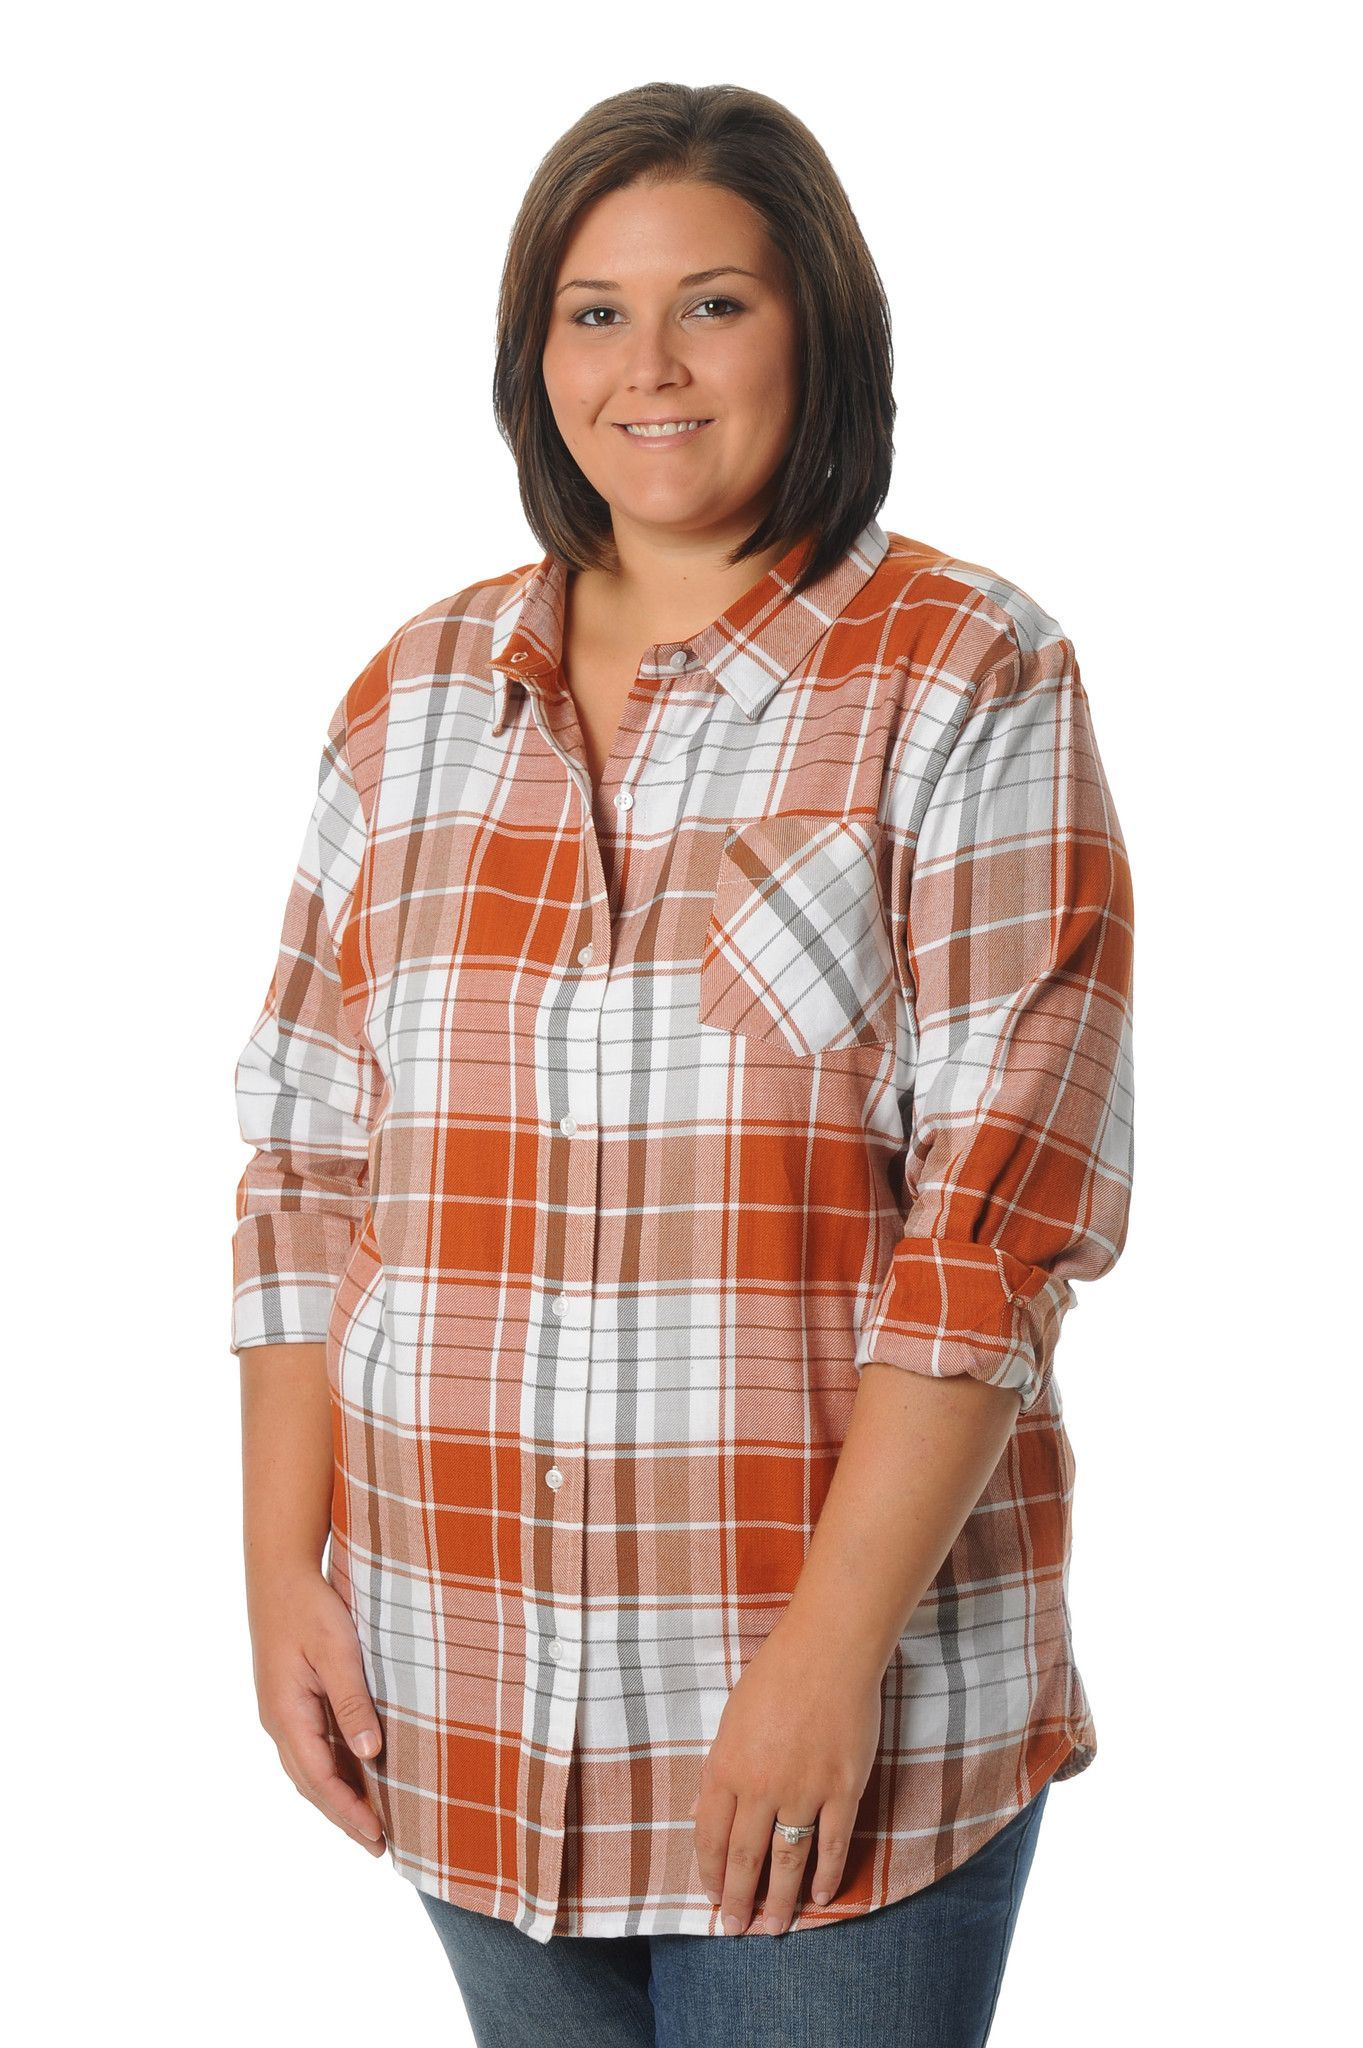 Burnt orange dress plus size  Plus Size Burnt Orange Boyfriend Plaid Top  Things to Wear